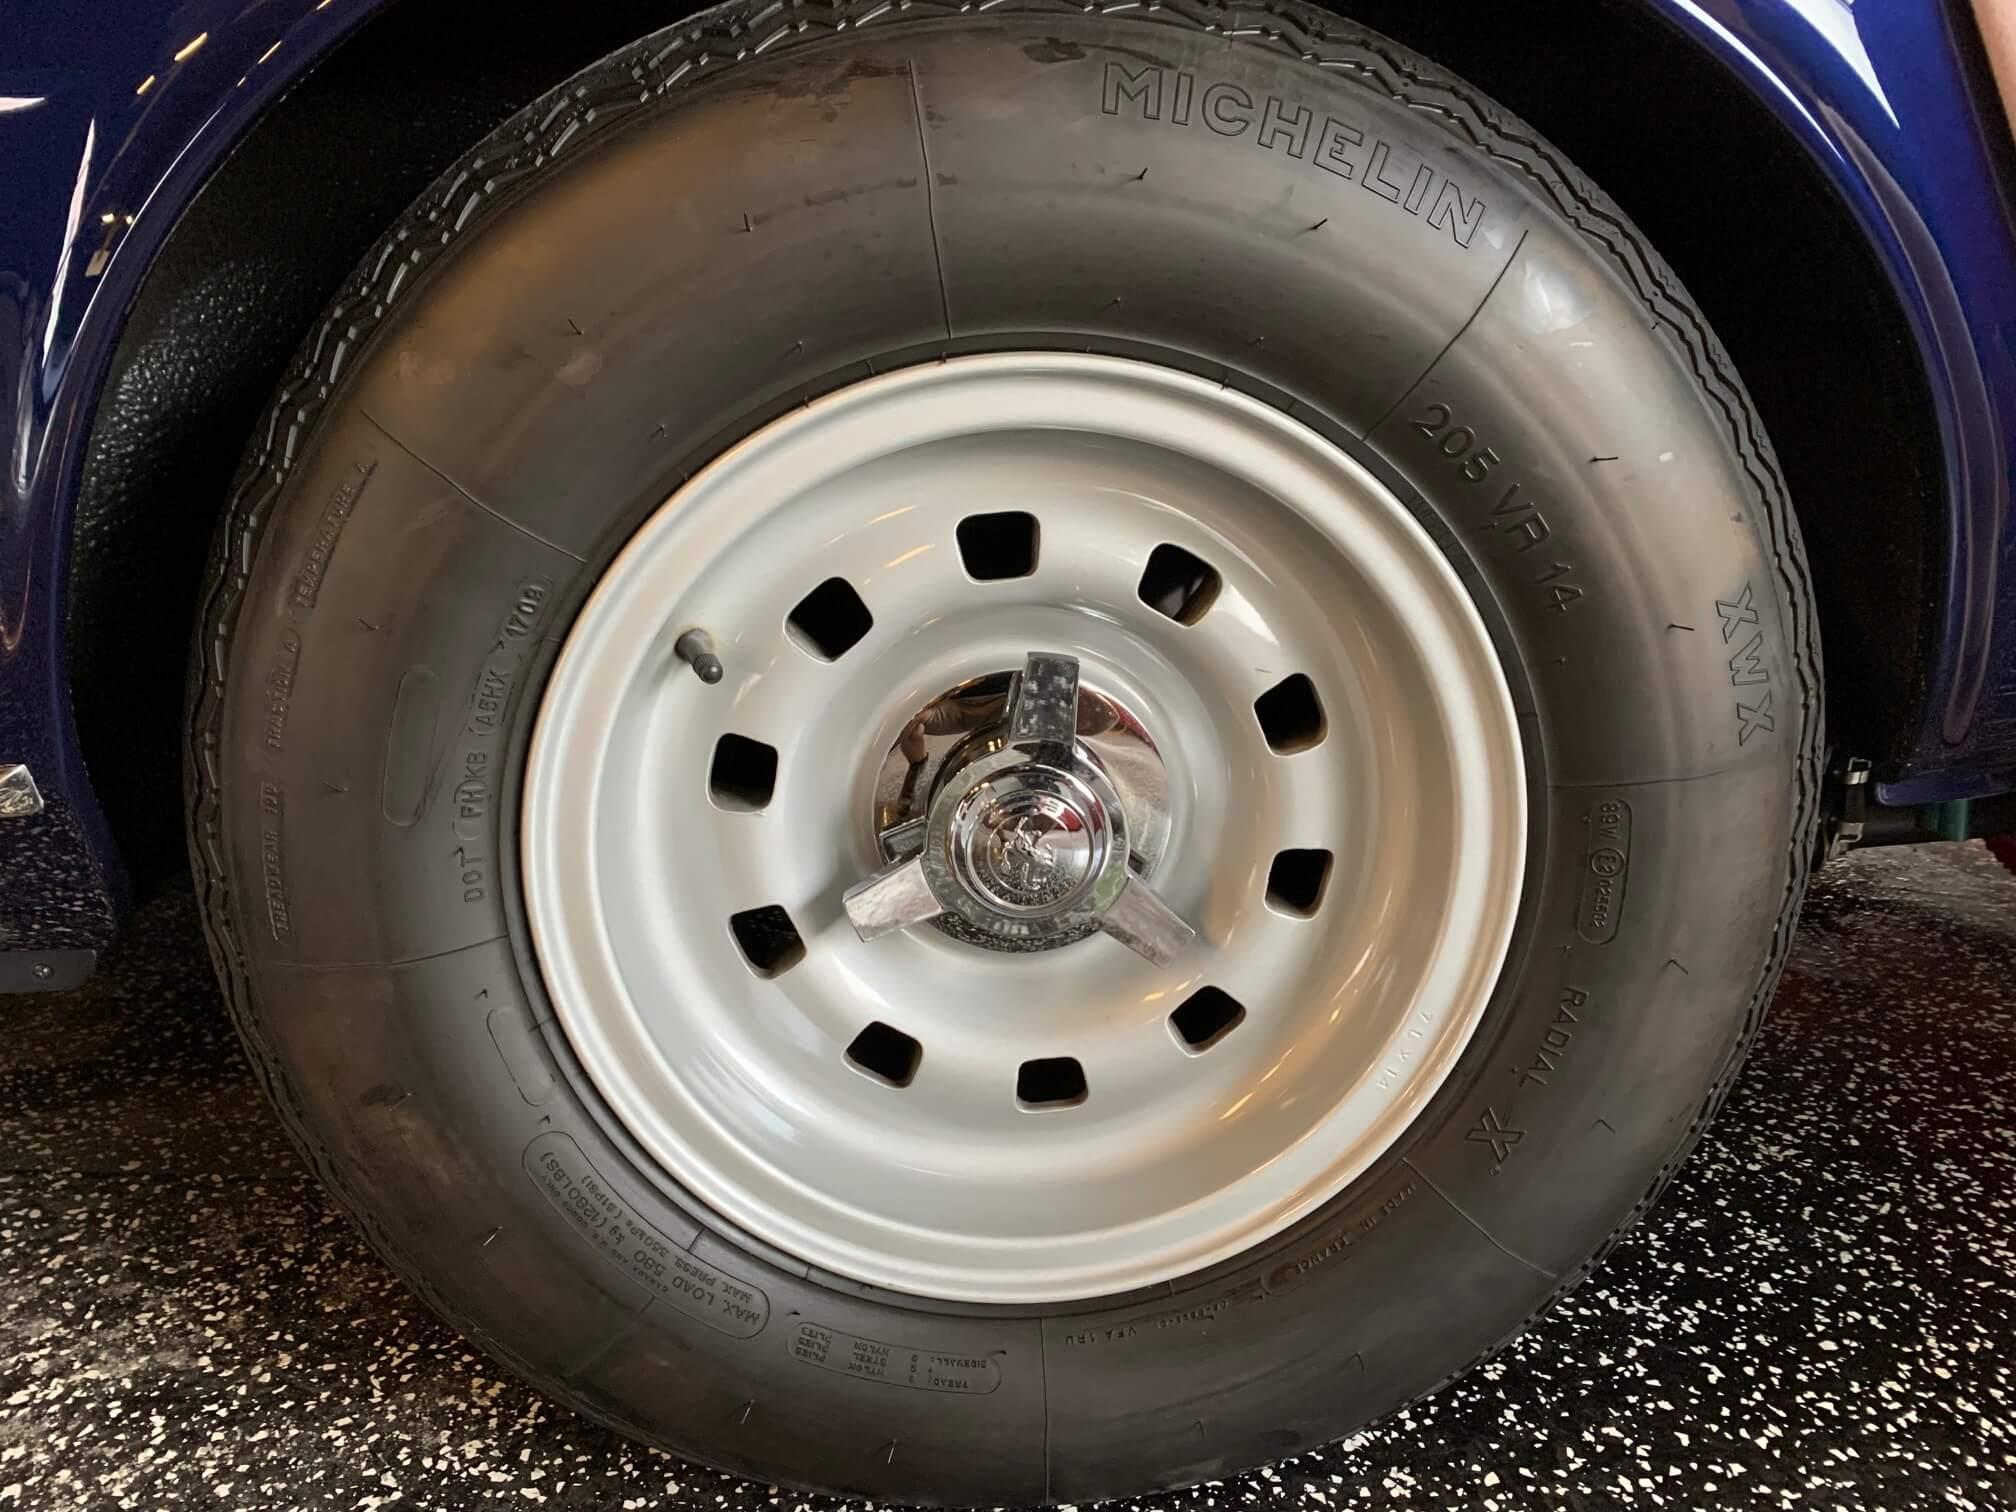 Ferrari 330 GTC Left rear wheel & tire